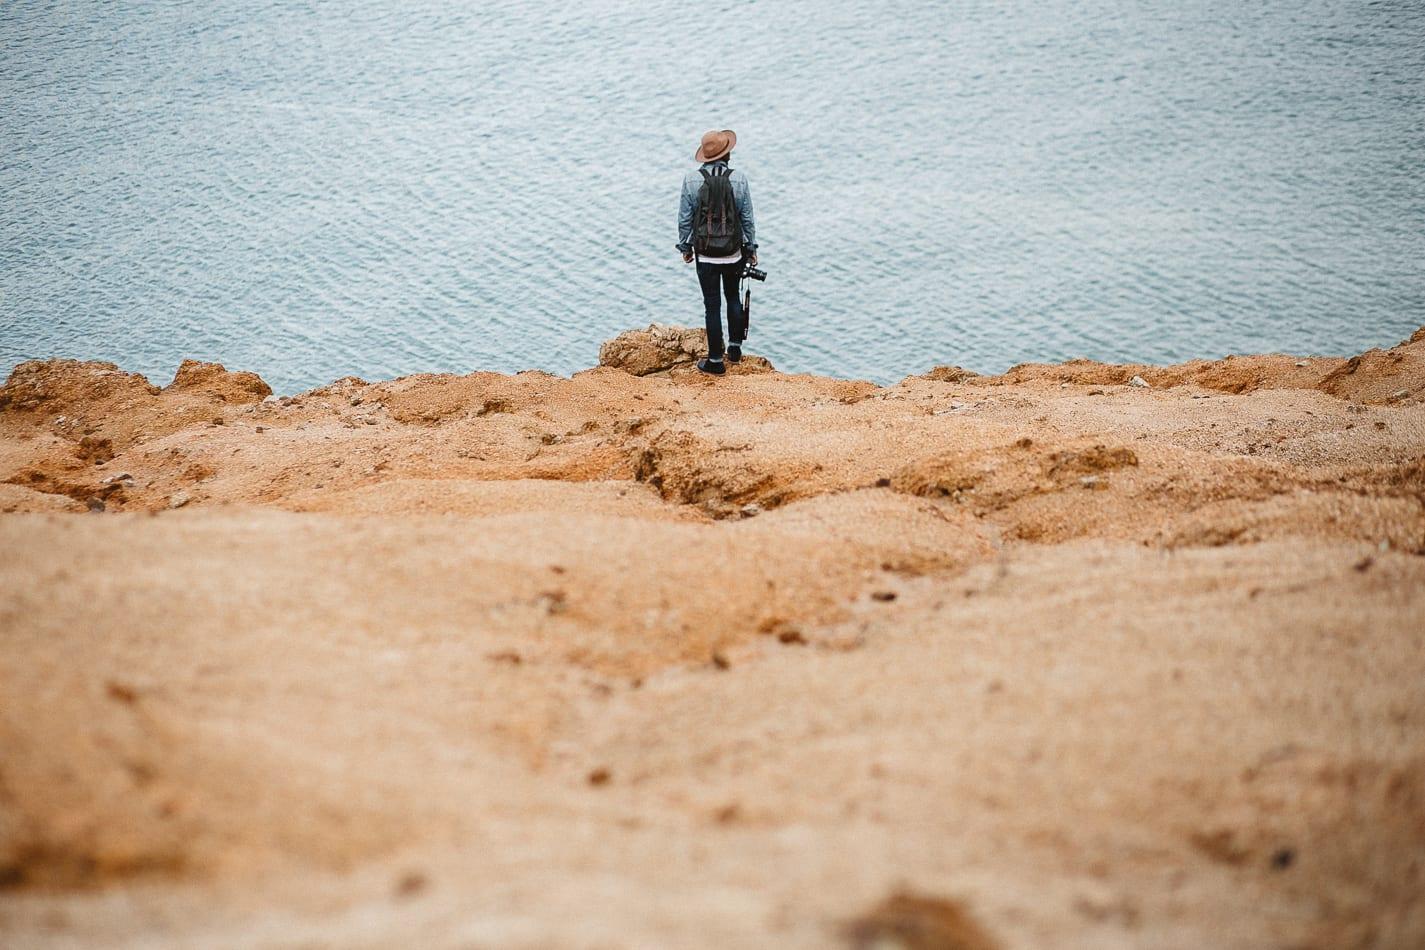 shasta-lake-redding-california-lifestyle-portrait-photographer-7